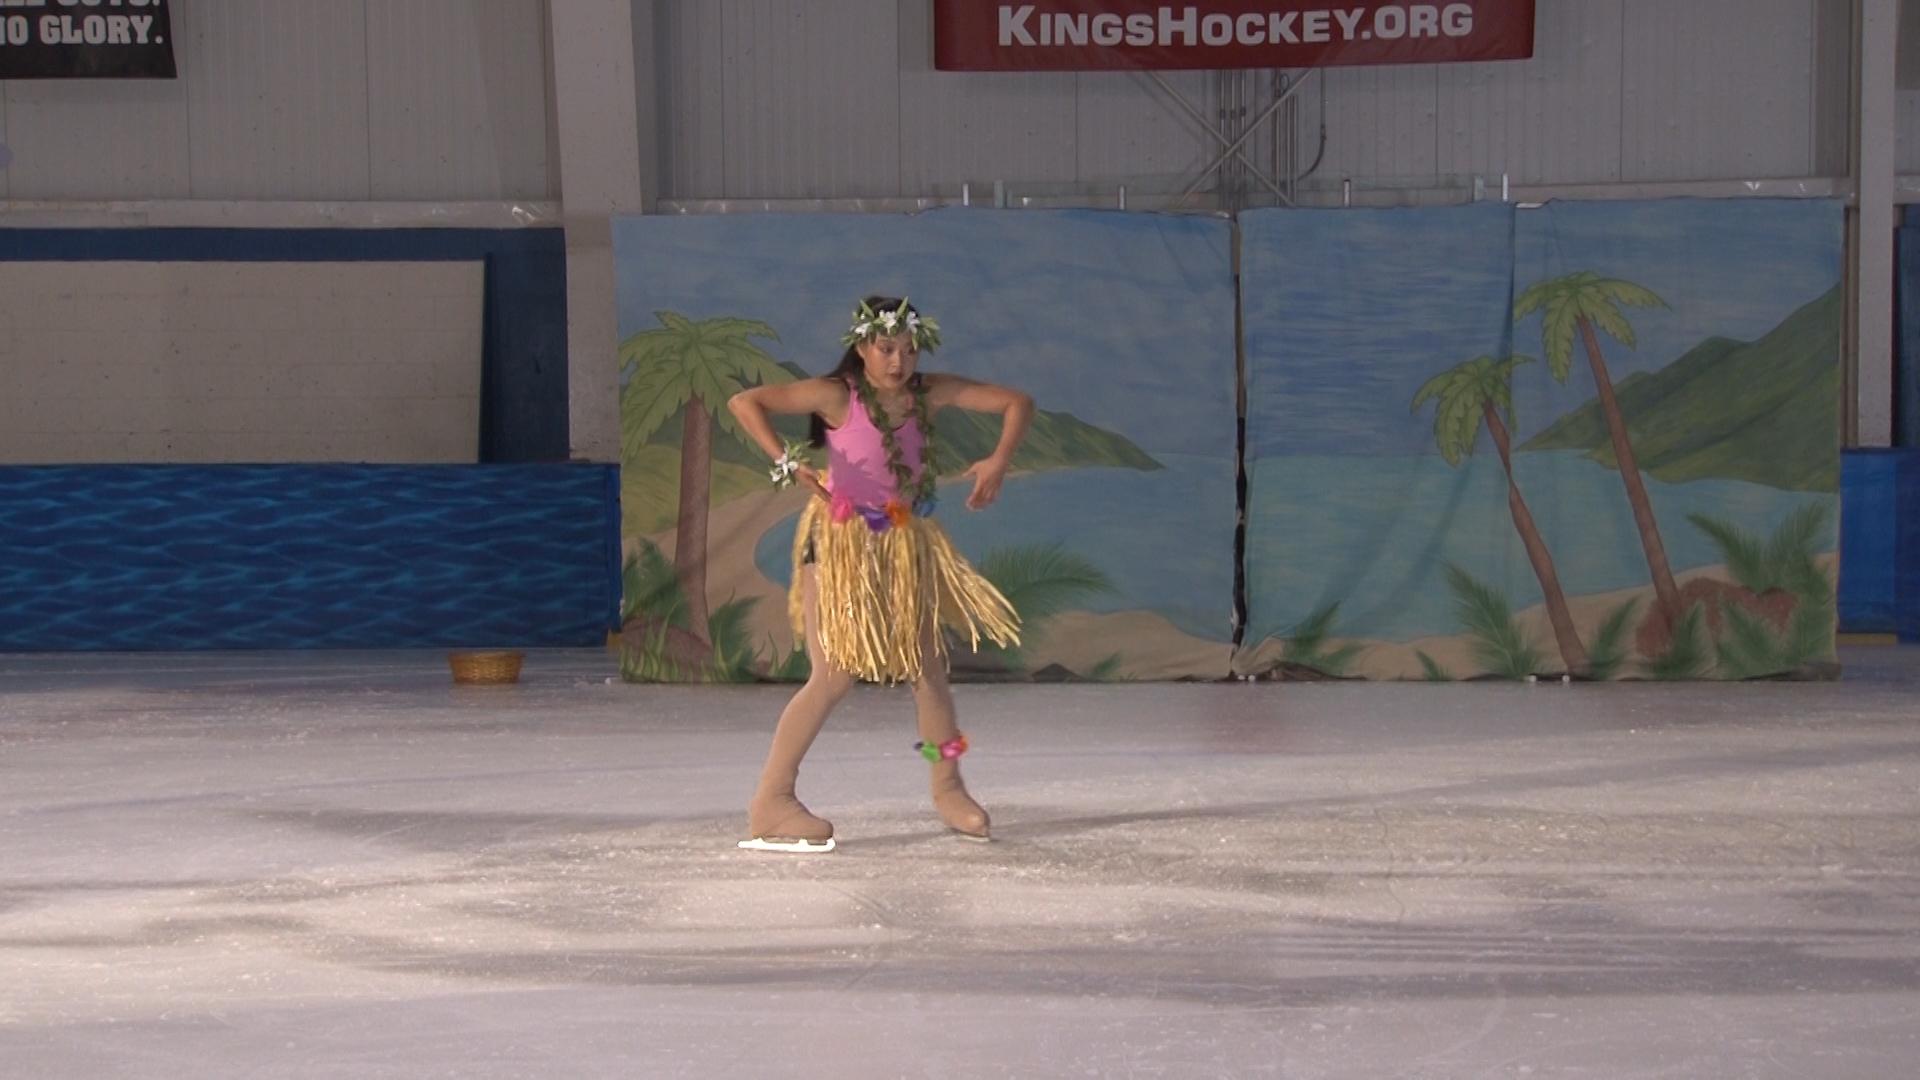 Power Play Maui Skate on Ice 071417.00_15_59_02.Still027.jpg